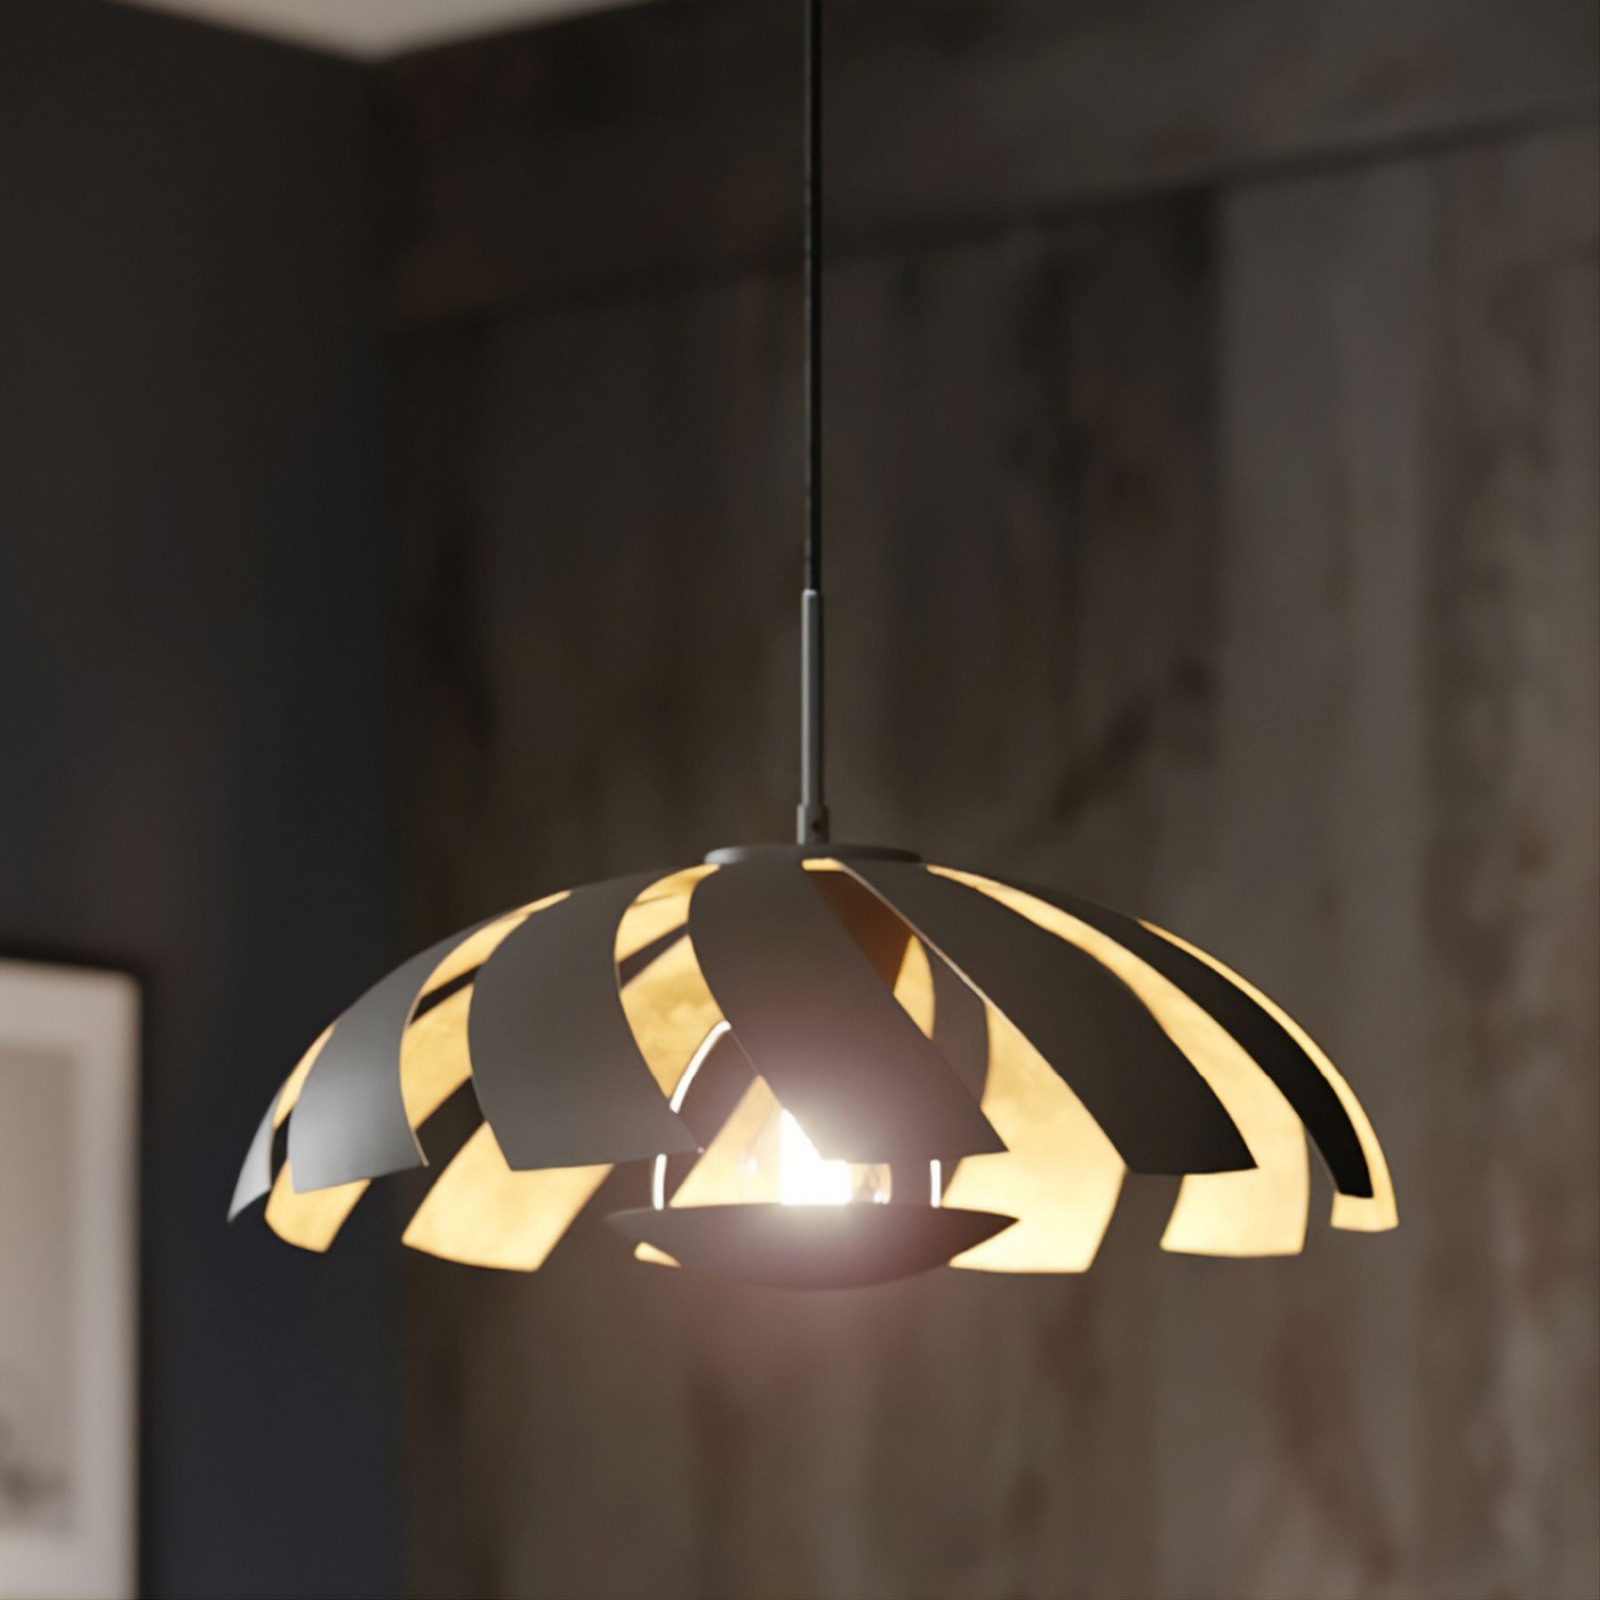 Lucande Archilleas lampa wisząca, czarno-złota